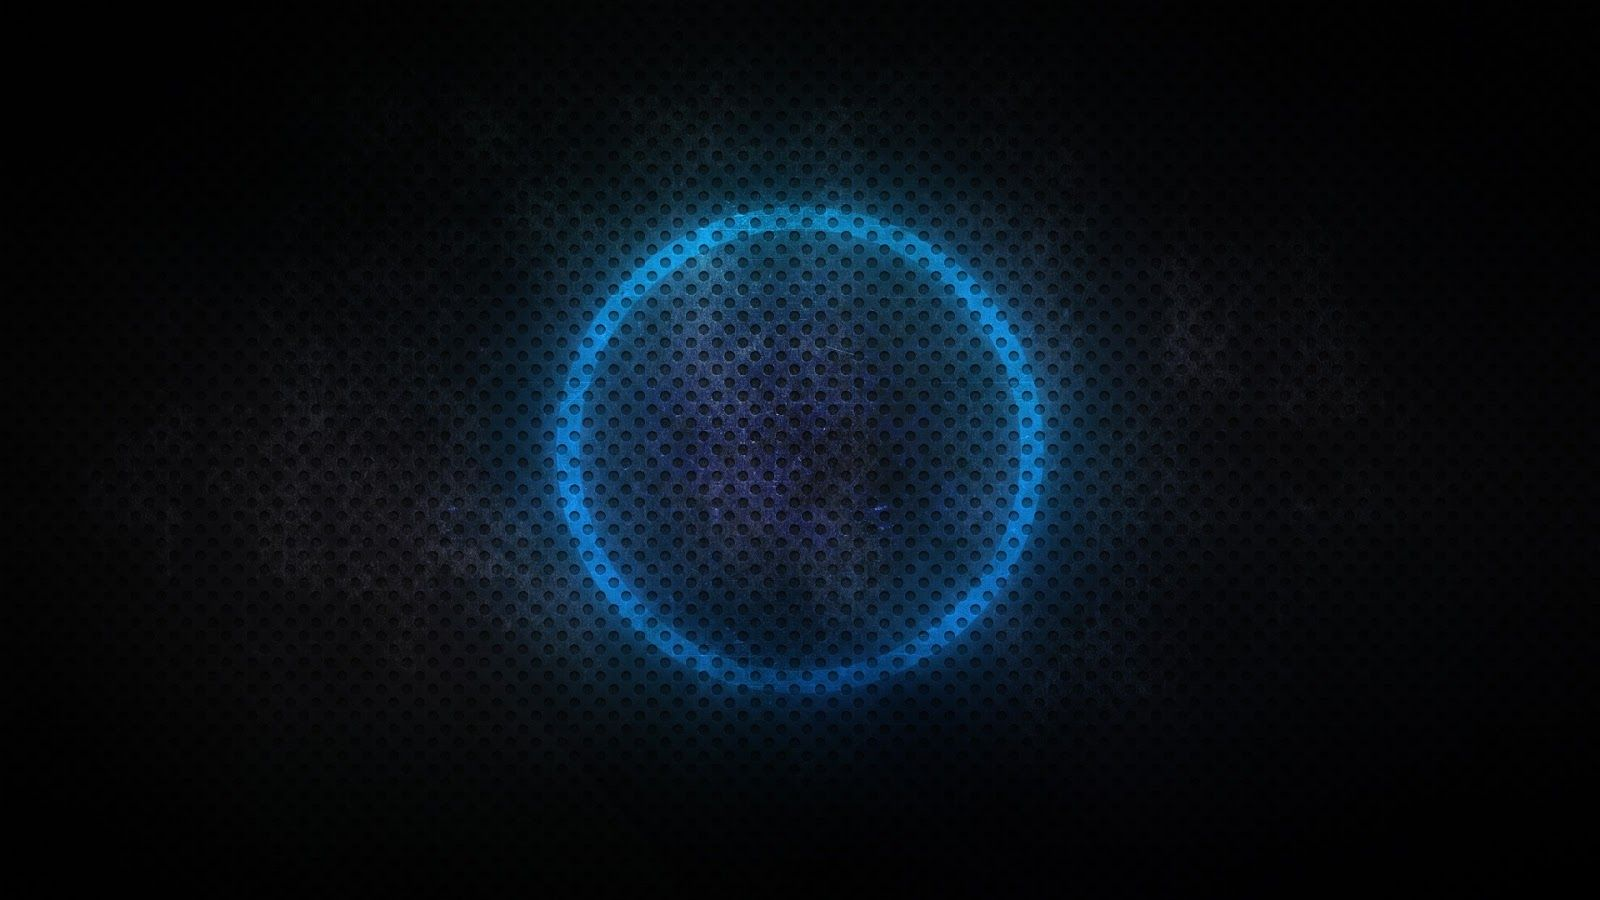 beautiful neon circles 4k - photo #22